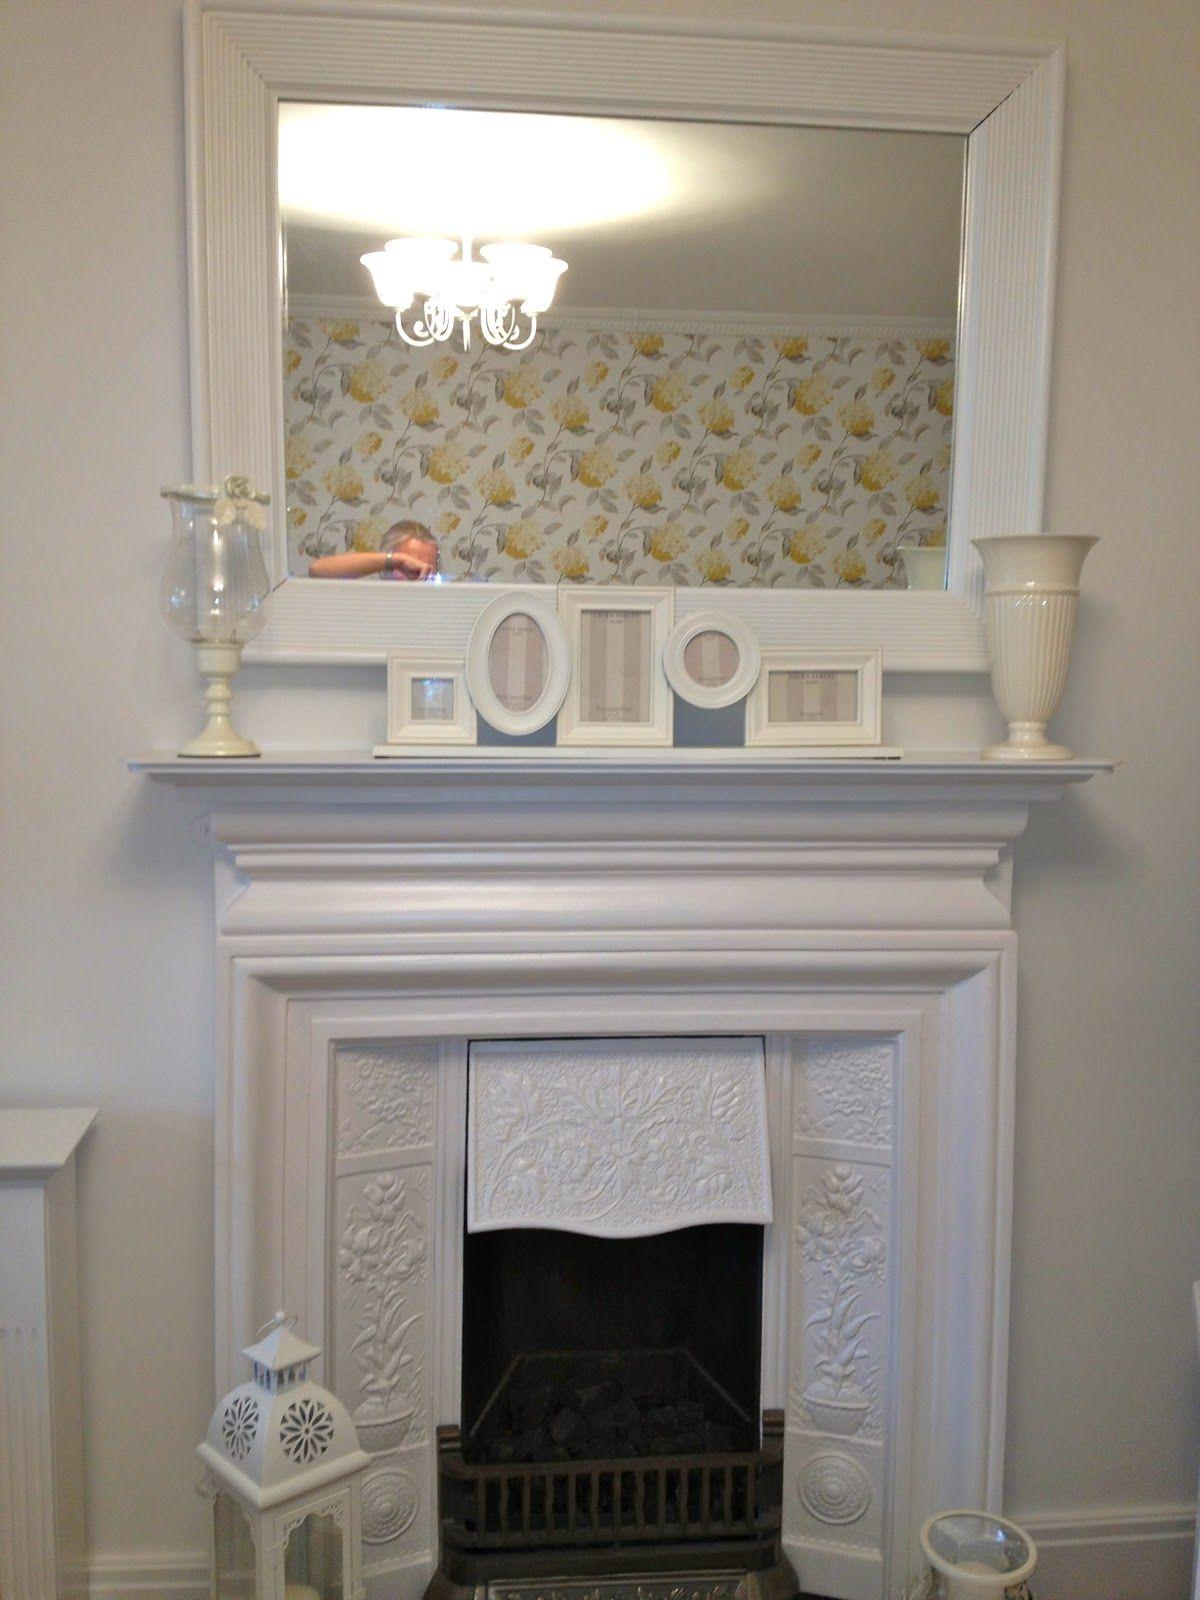 Dulux Subtle Ivory 4 Home Wall Colors Home Decor